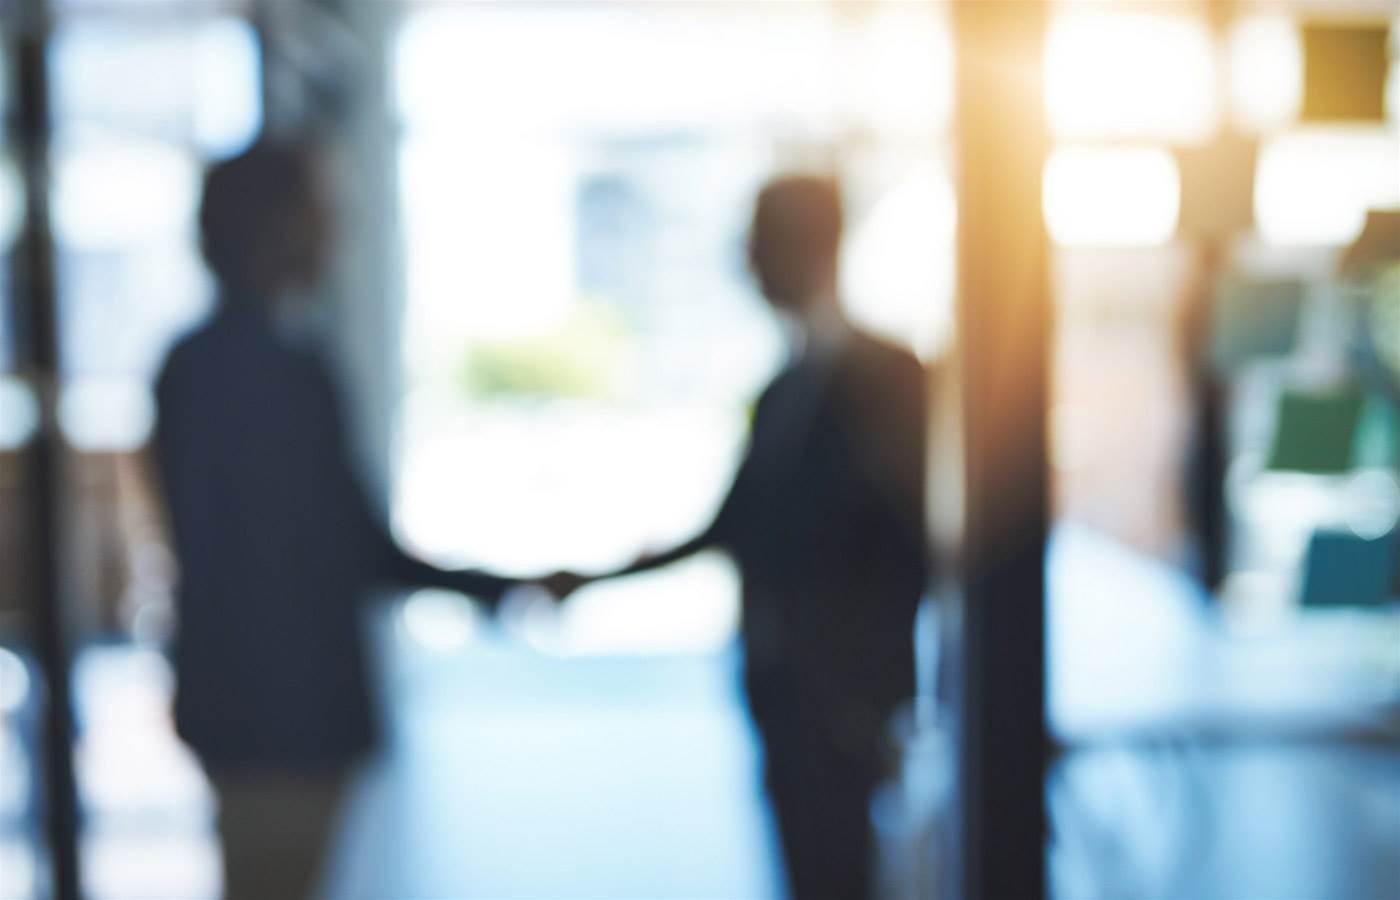 Adelaide-based Telstra partner Wireless Communications acquired